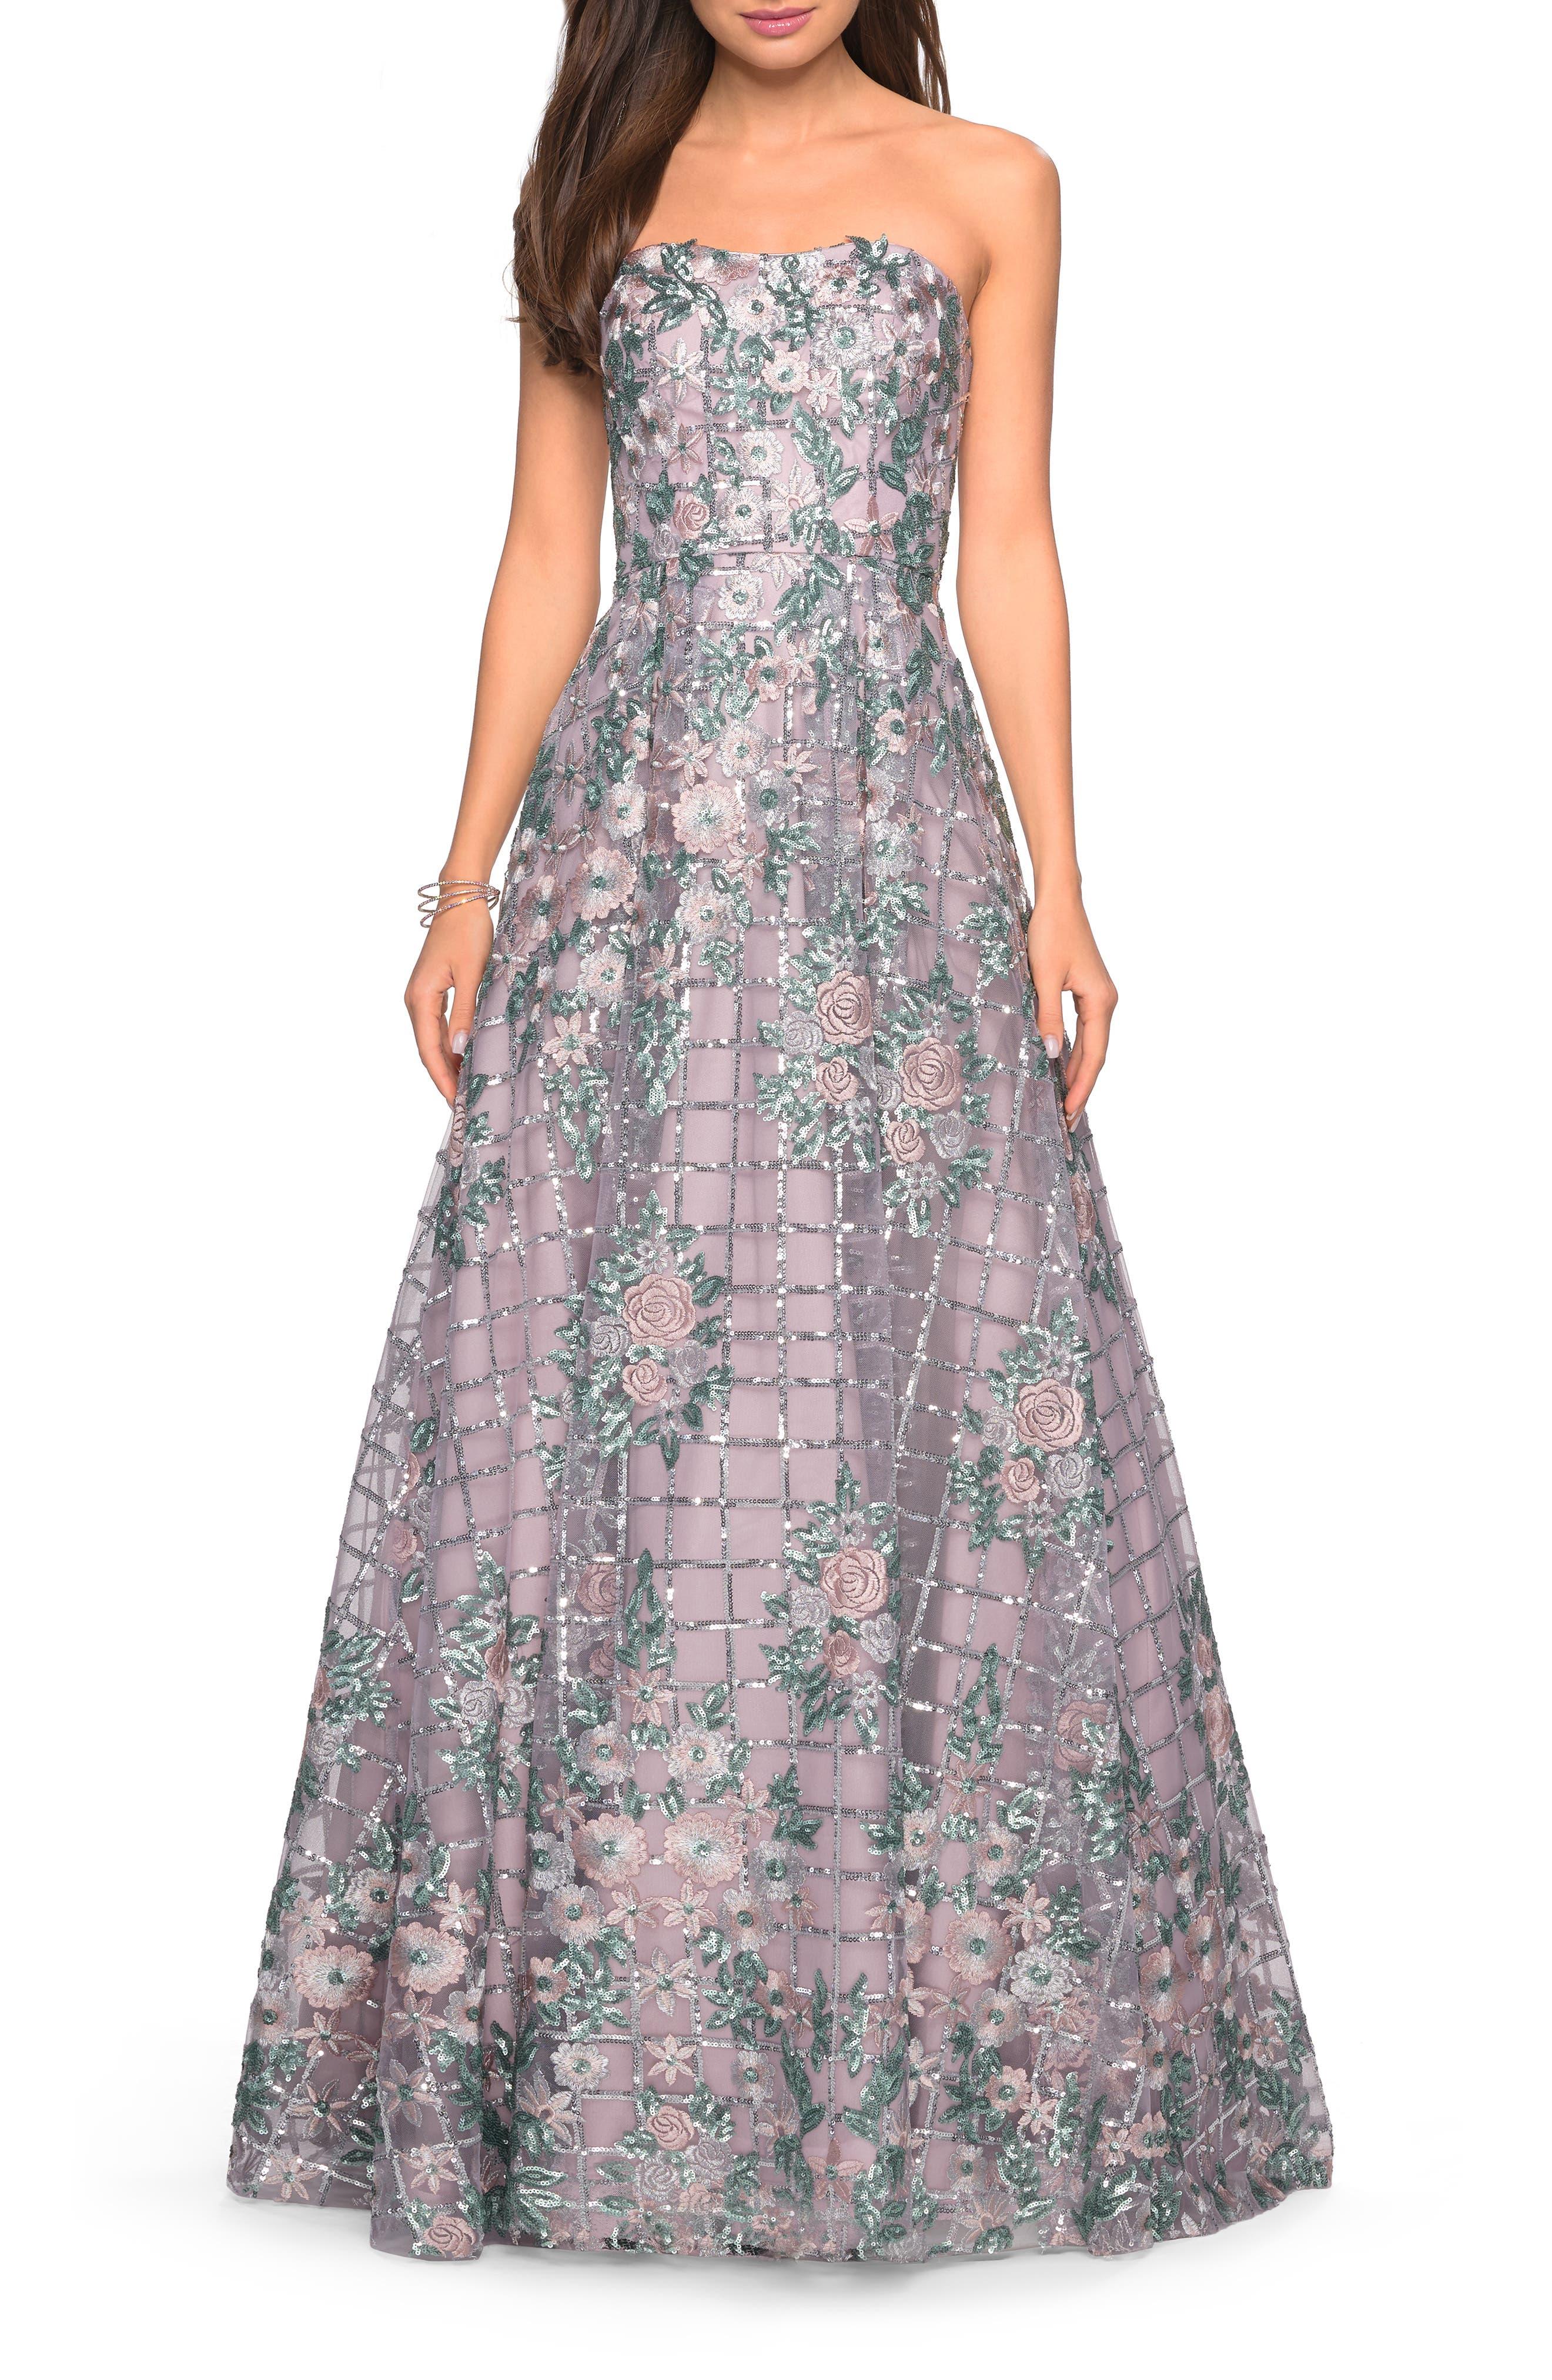 La Femme Strapless Sequin Evening Gown, 8 (similar to 16W-18W) - Purple